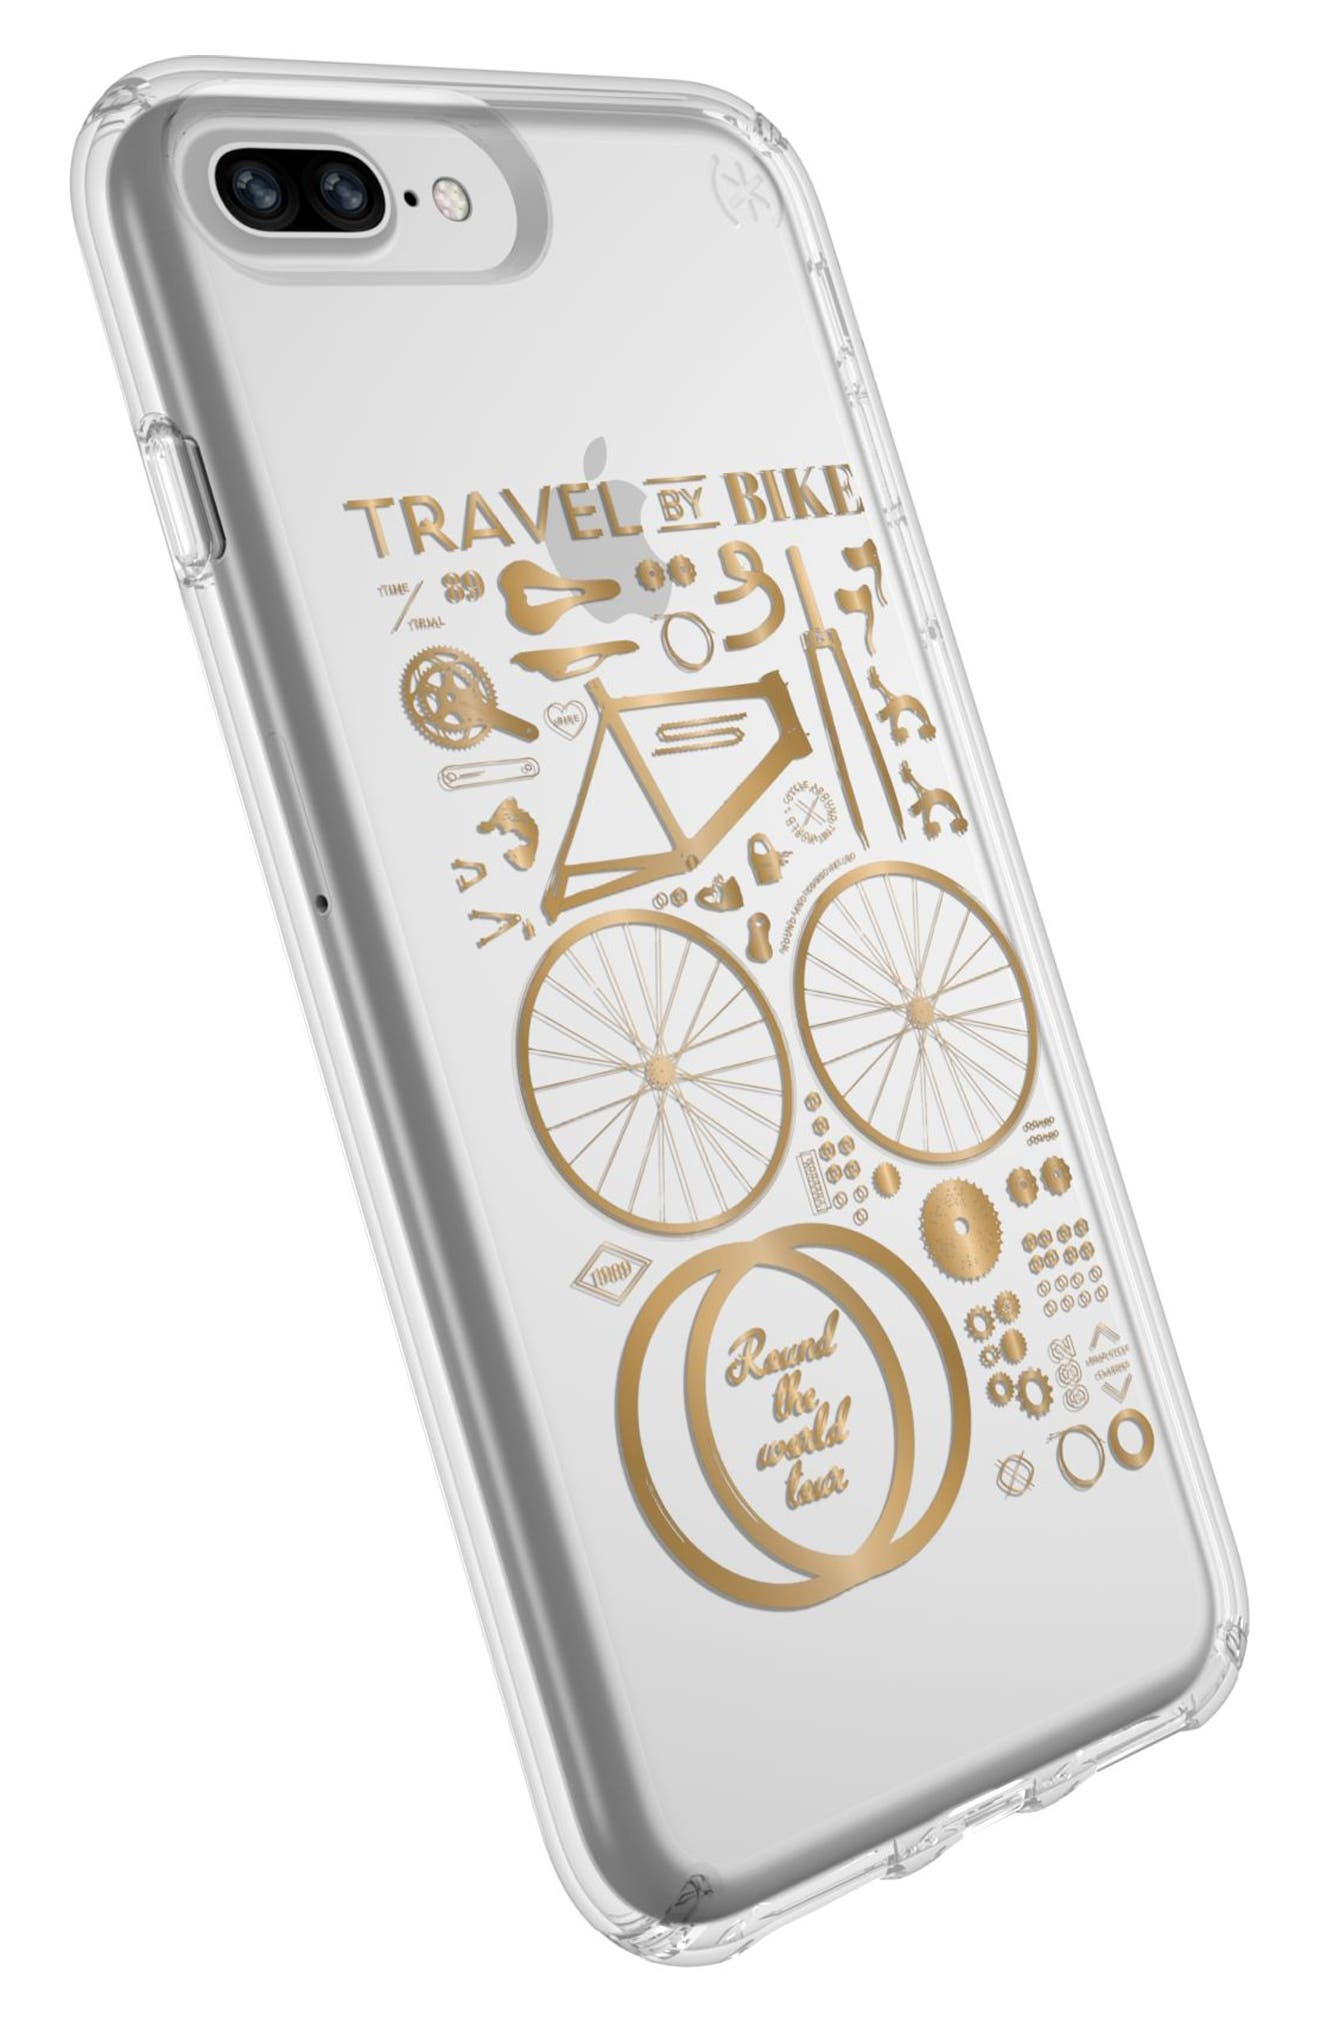 iPhone 6 Plus/6S Plus/7 Plus/8 Plus Case,                             Alternate thumbnail 4, color,                             Citybike Metallic Gold/ Clear